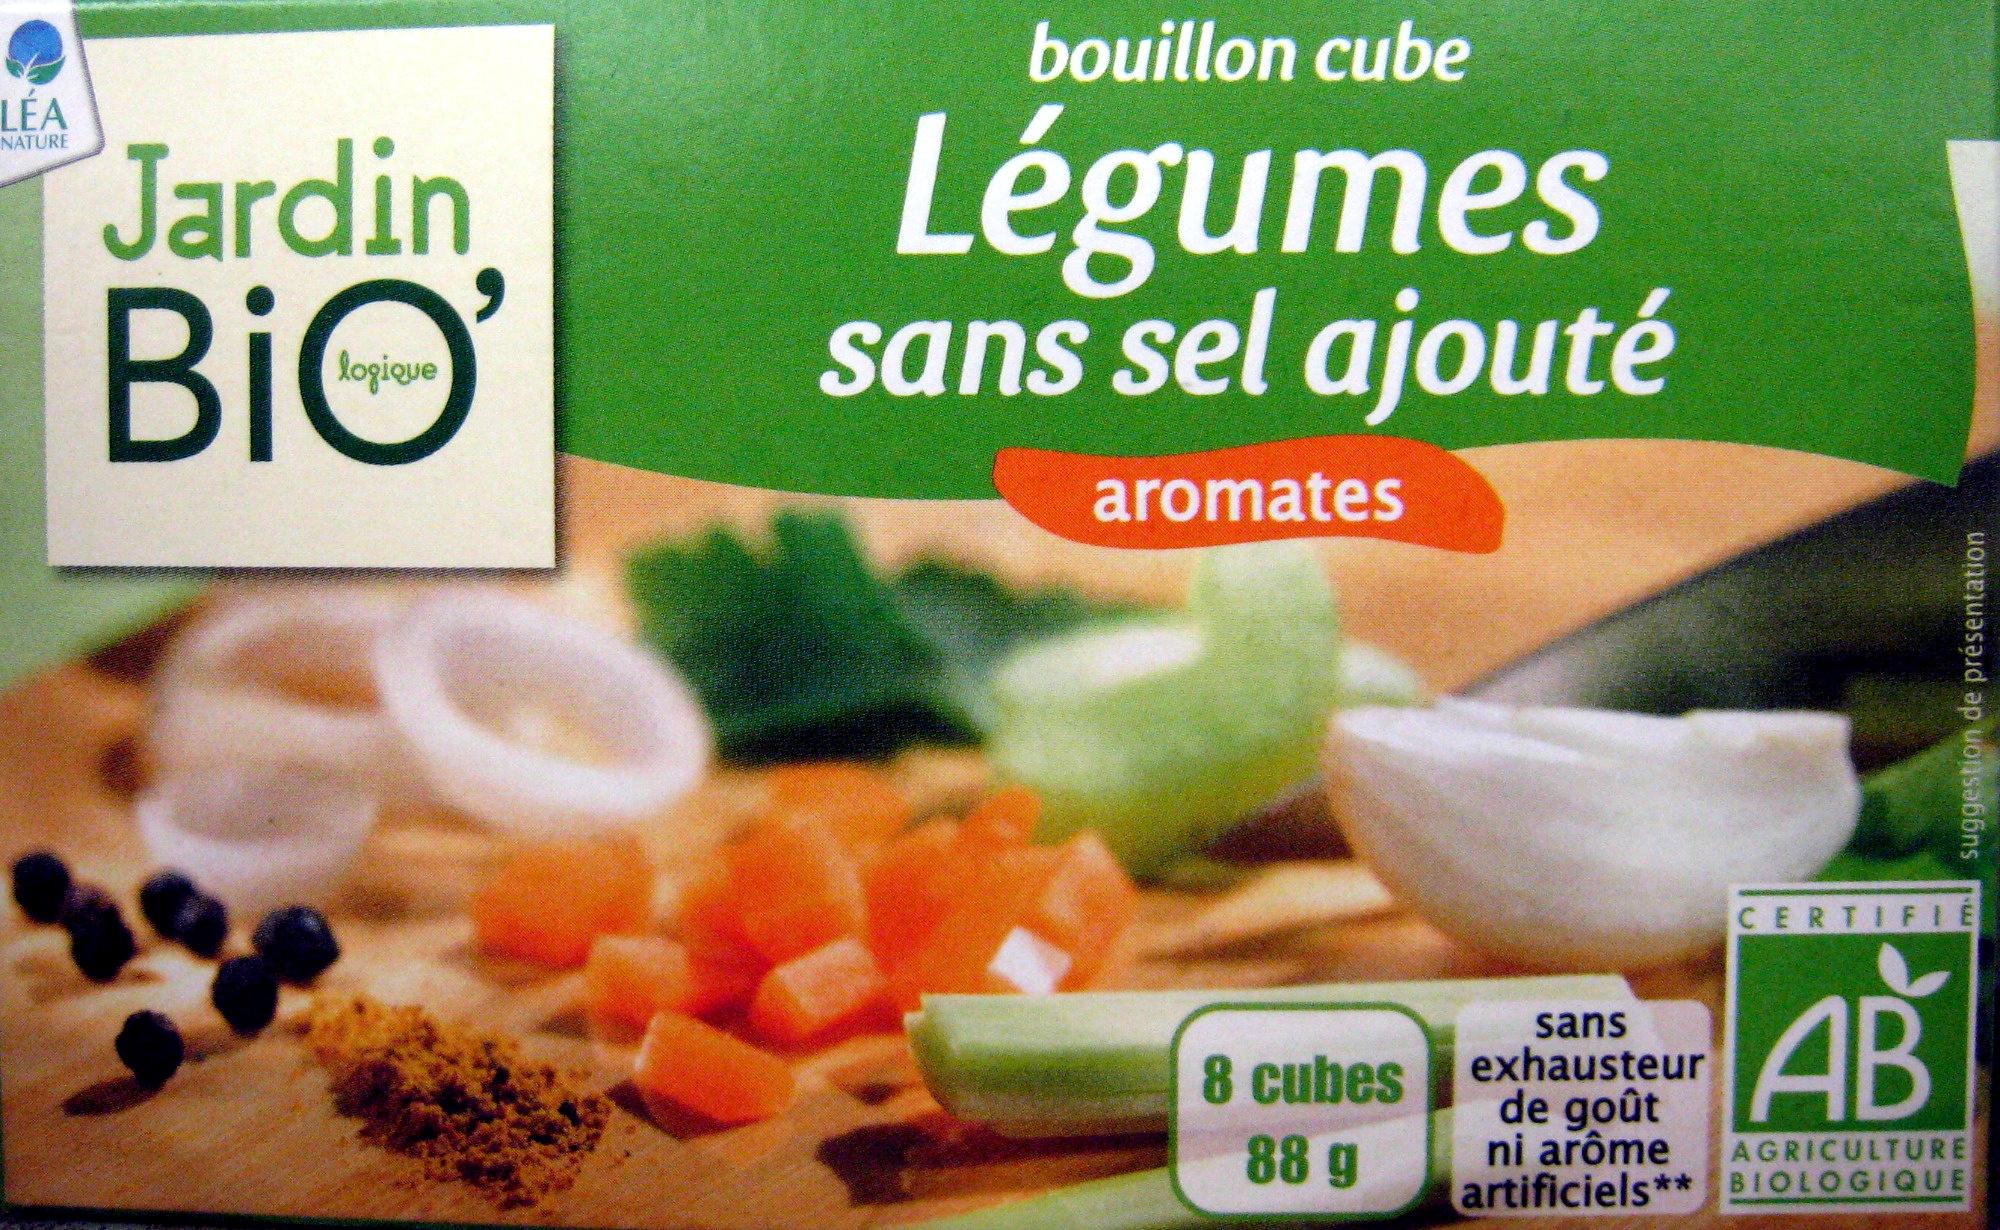 Bouillon cube l gumes sans sel ajout aromates jardin bio for Jardin bio